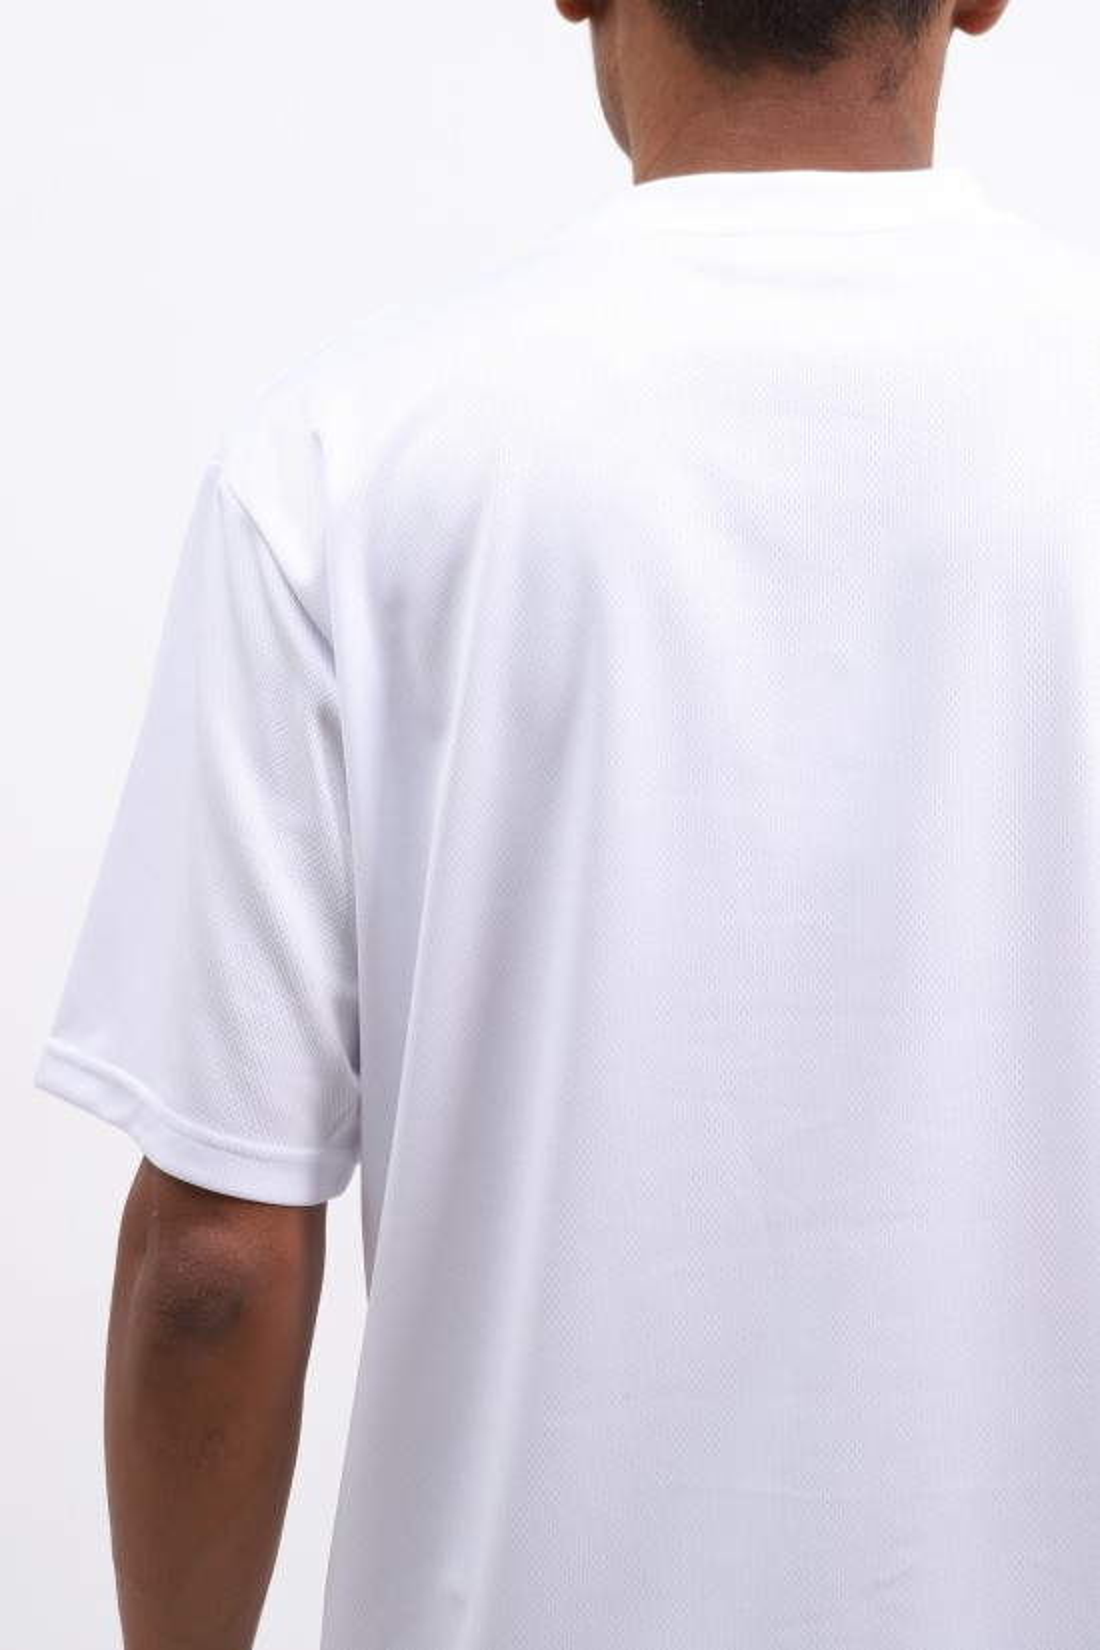 RAVE / Beyond jersey White